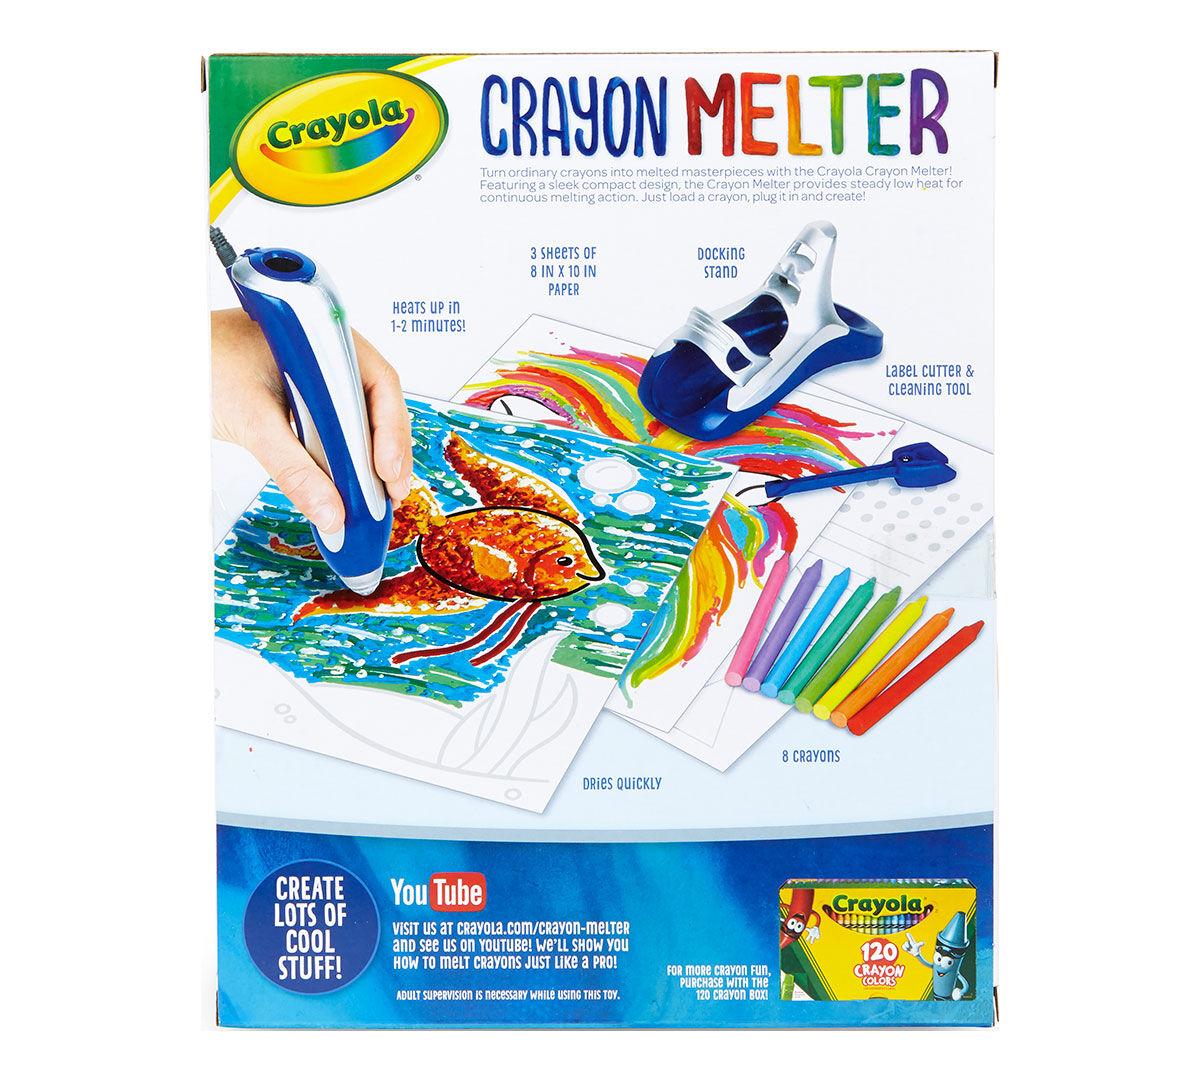 Crayon Melter Coloring Page | Crayola Crayon Melter Create Art With Melted Crayons 1 Crayon